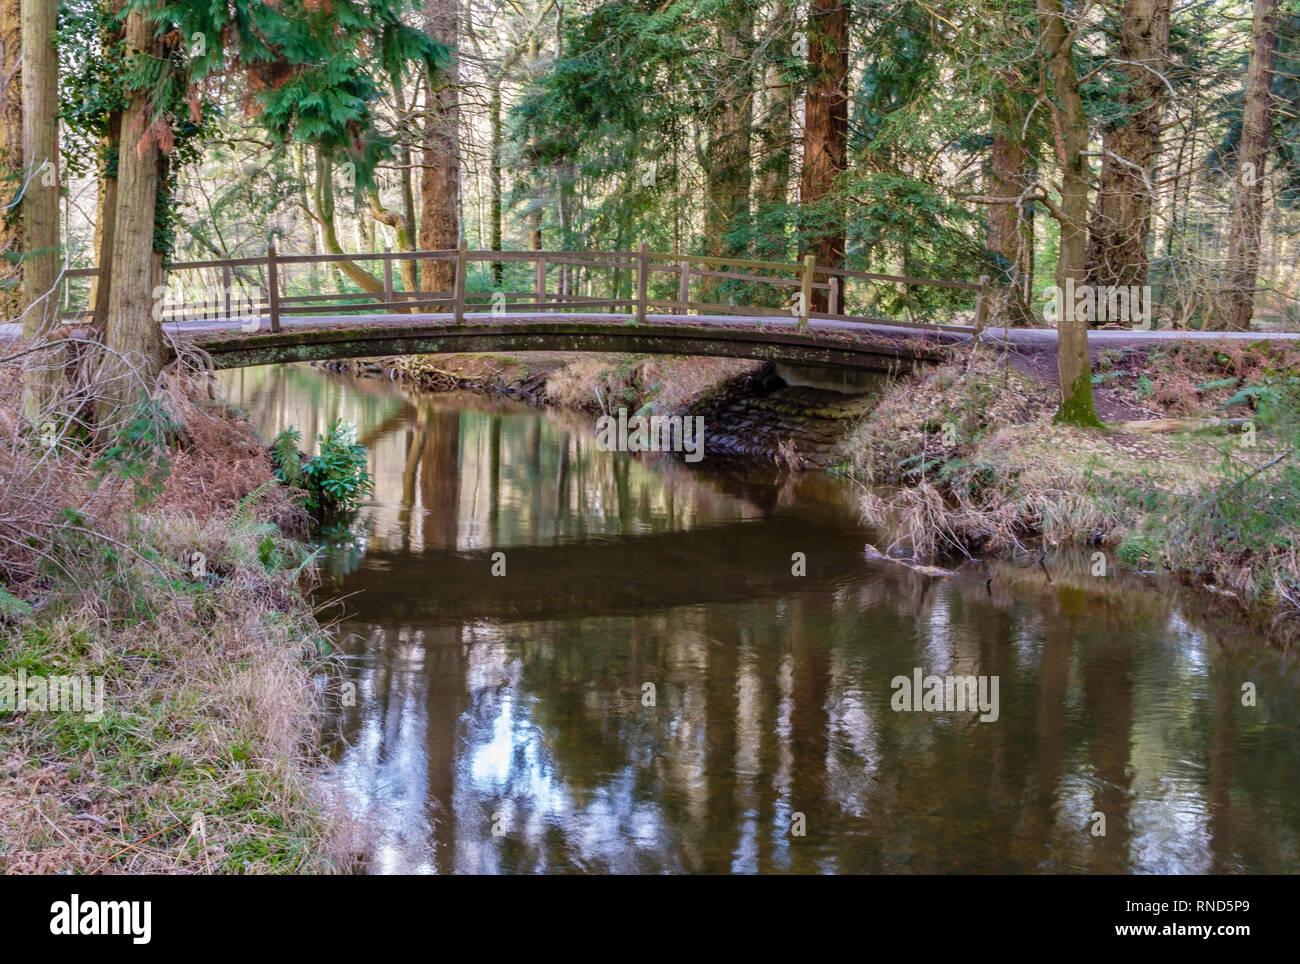 New Forest, Blackwater Bridge, Rhinefield Ornamental Drive, Brockenhurst, UK. - Stock Image